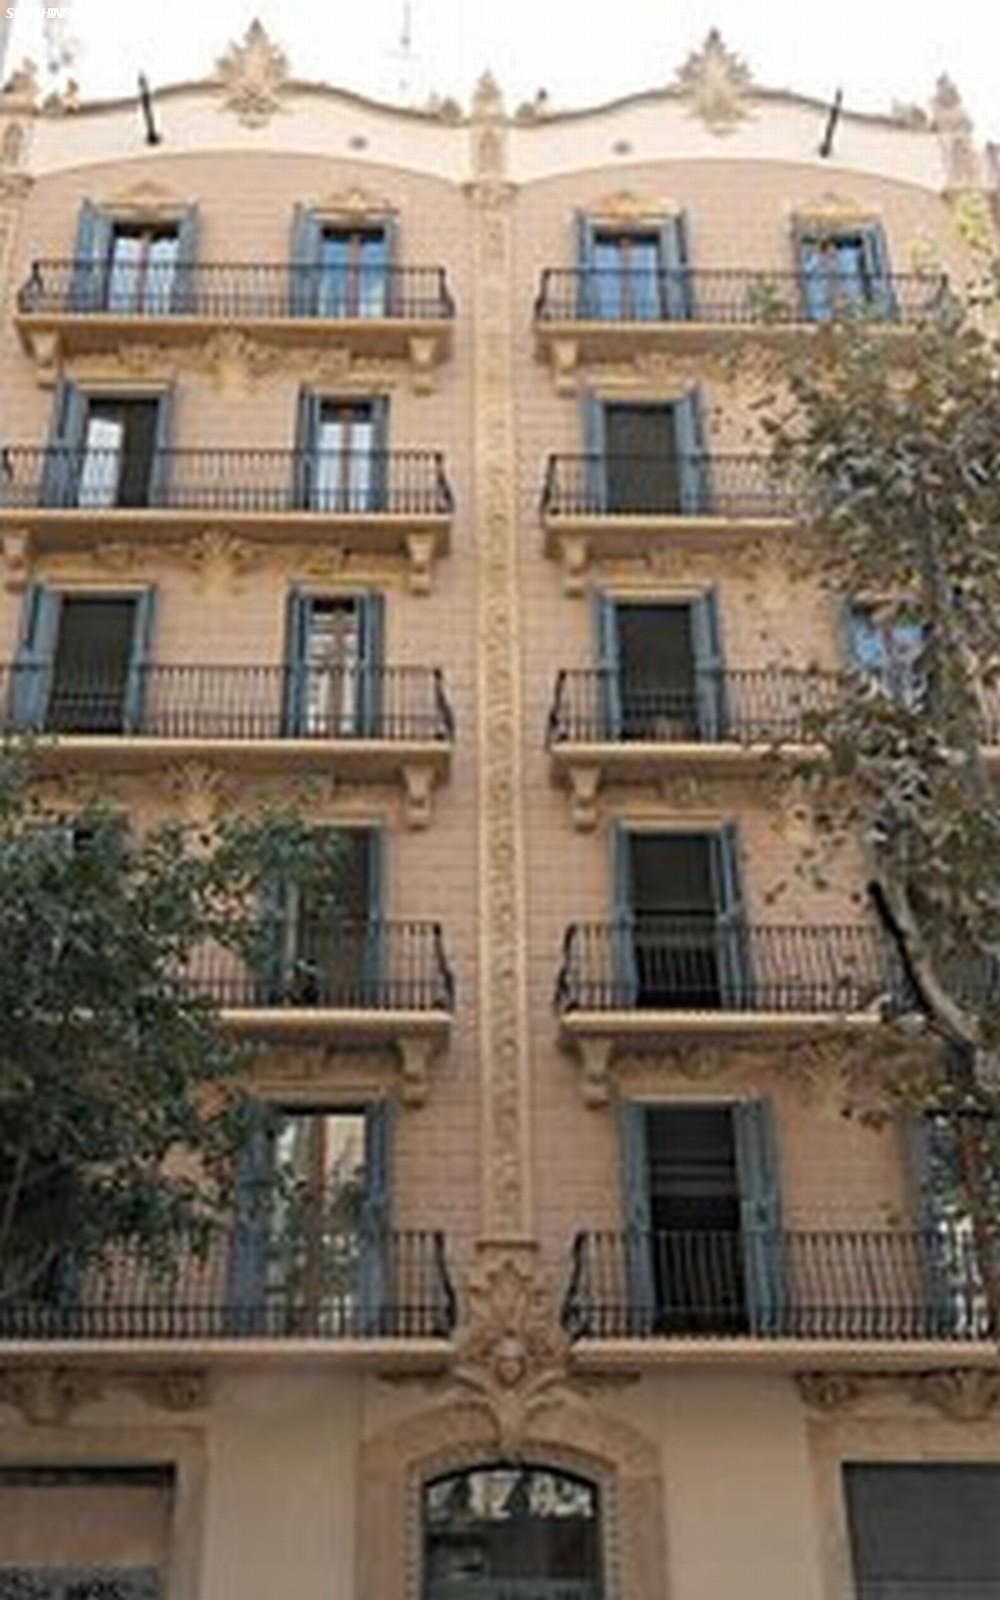 Hotel in spagna splendom suites a barcellona appartamenti for Affitti appartamenti barcellona spagna